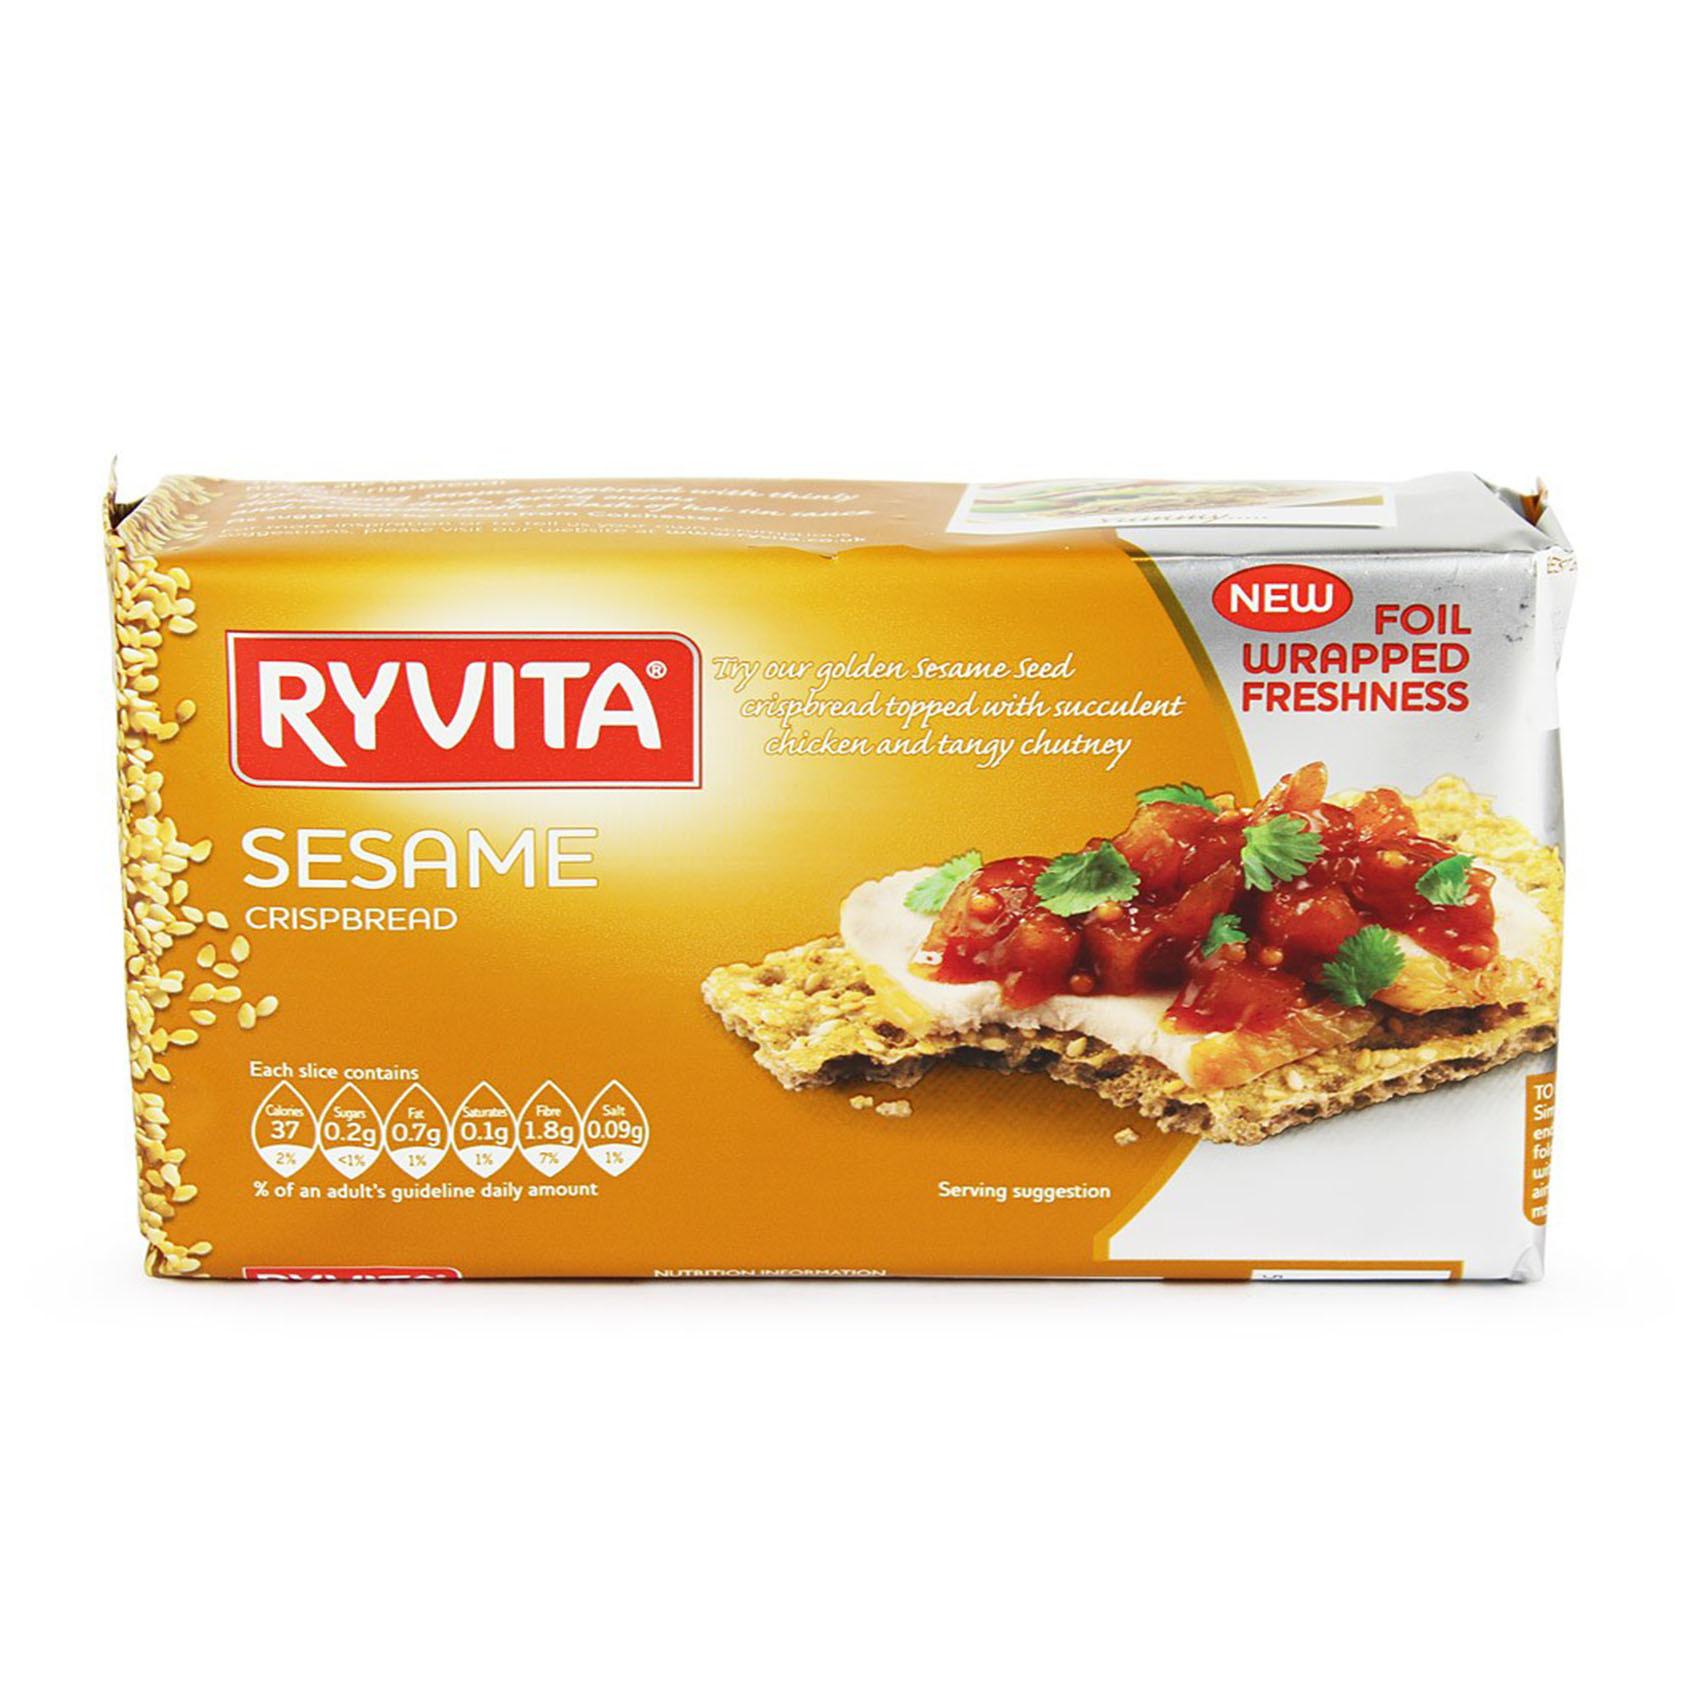 RYVITA SESAME 250G